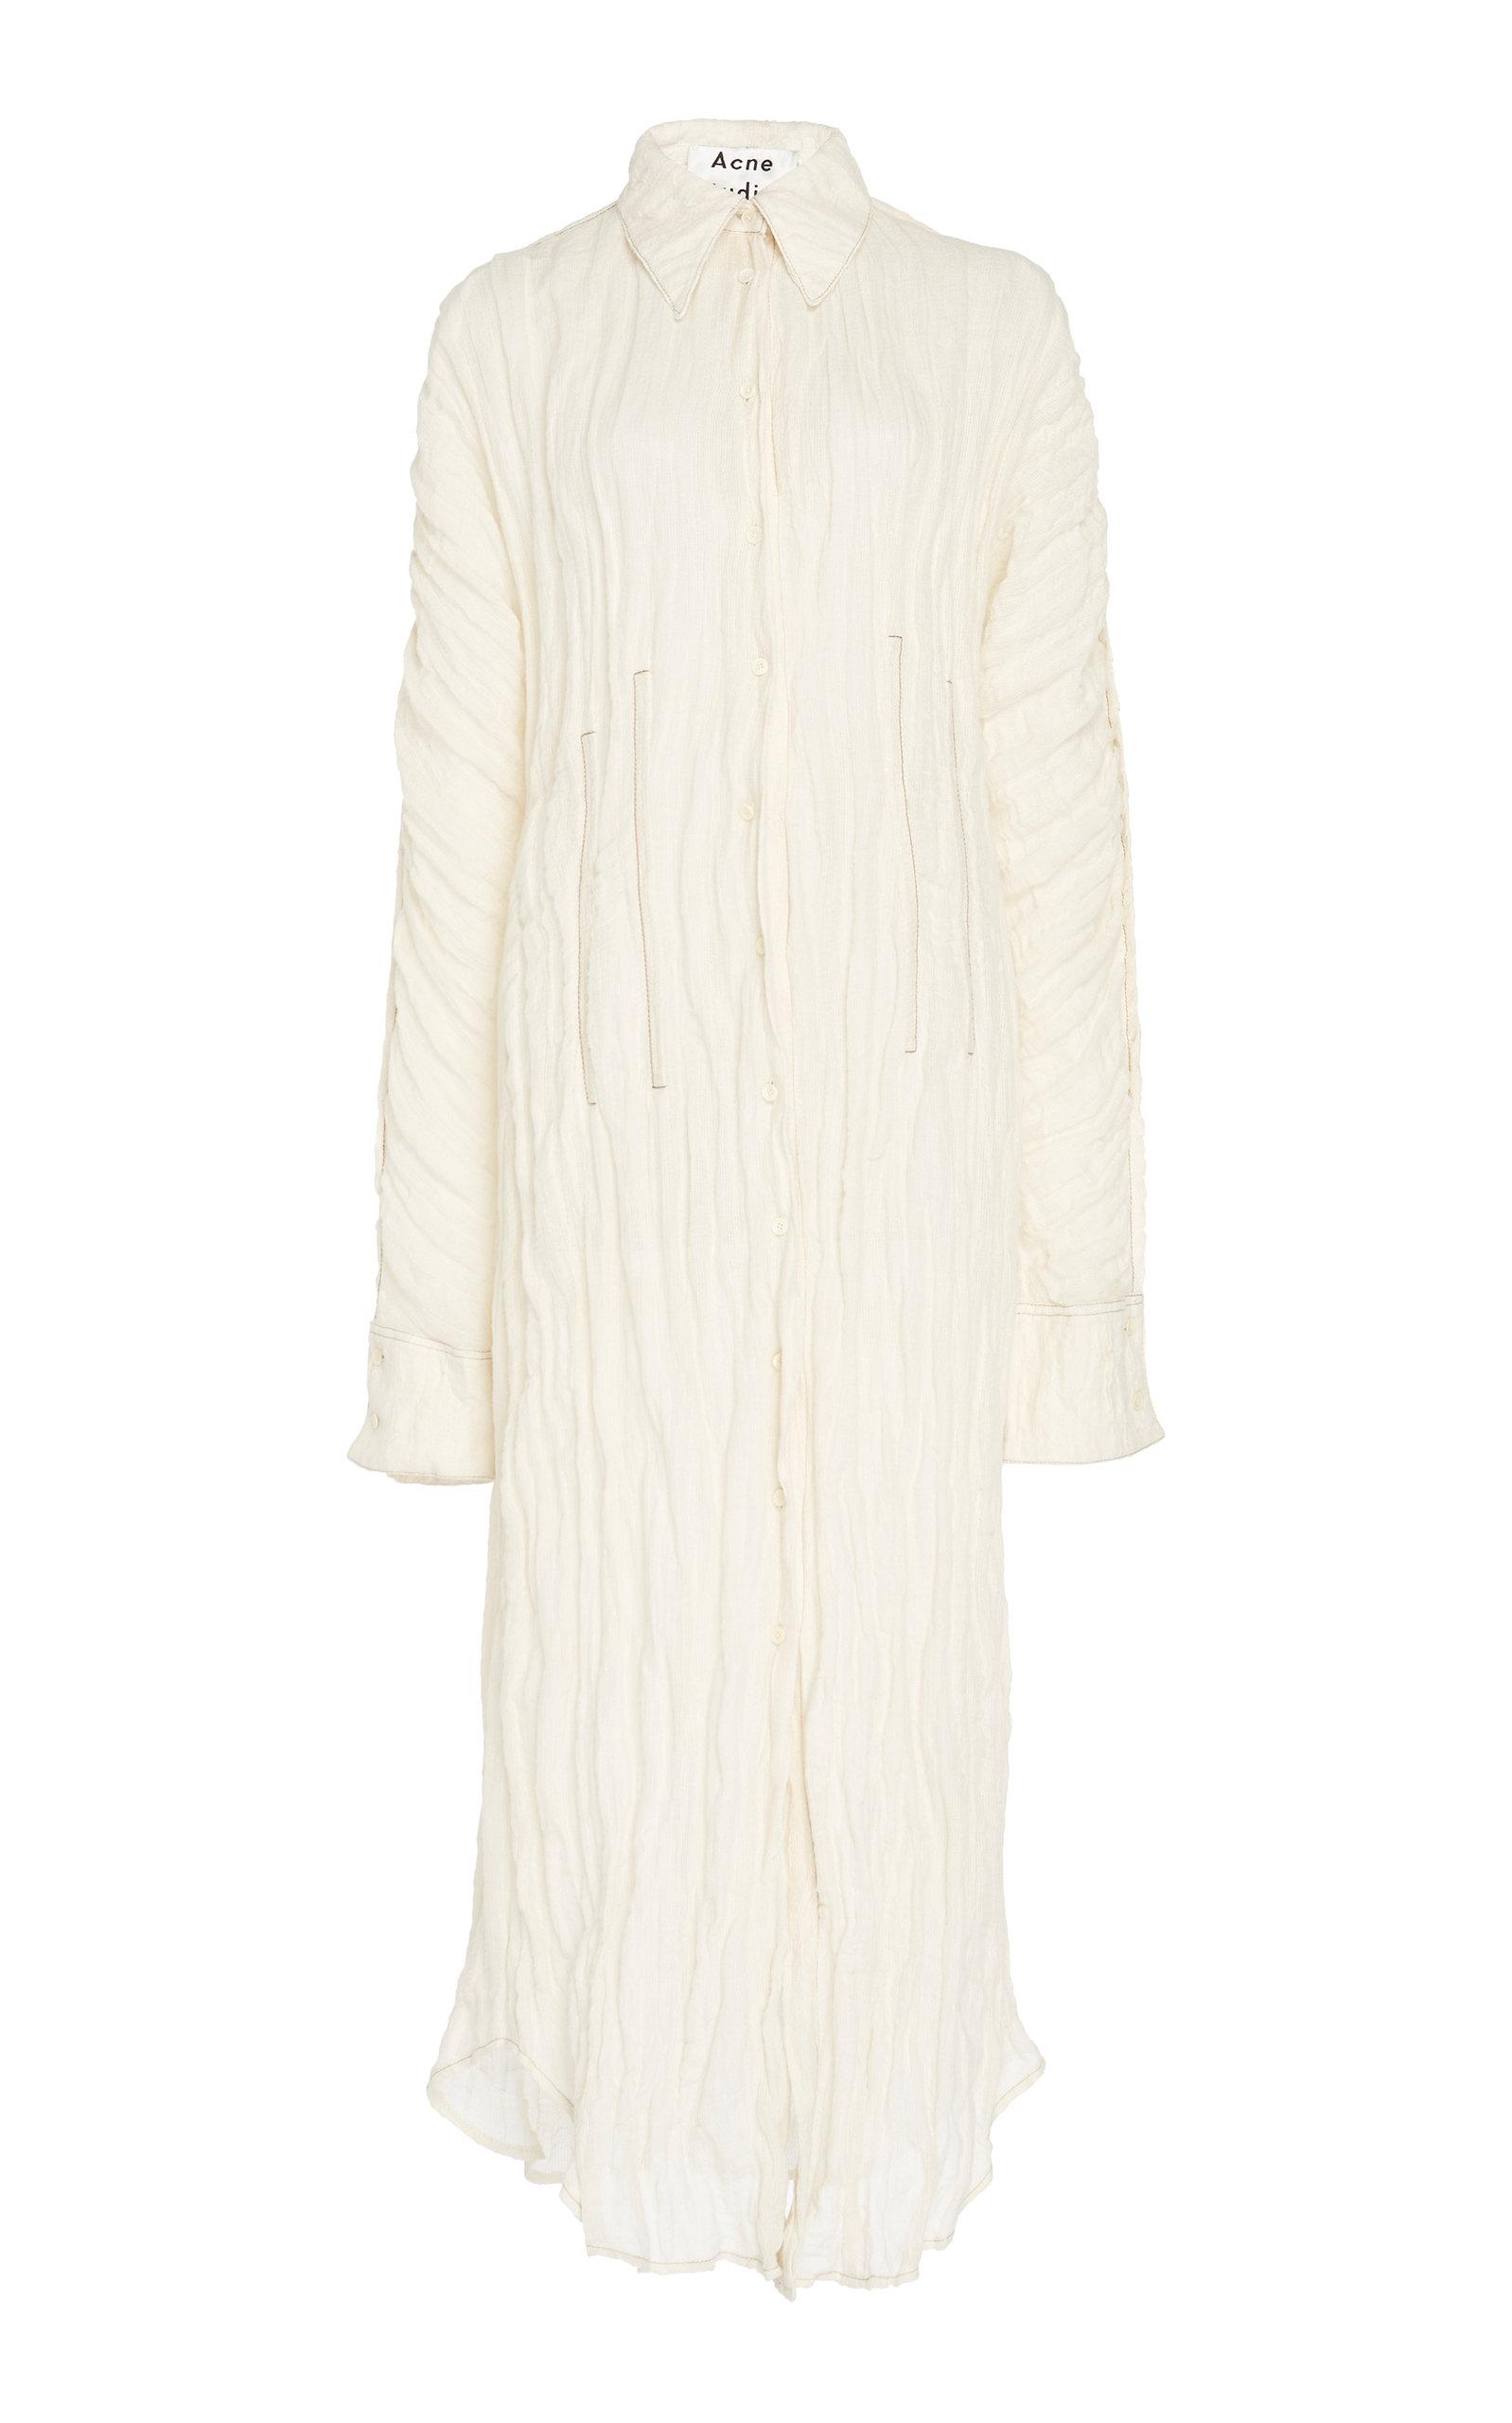 Acne Studios Dress Danete Crinkled Guaze Shirtdress